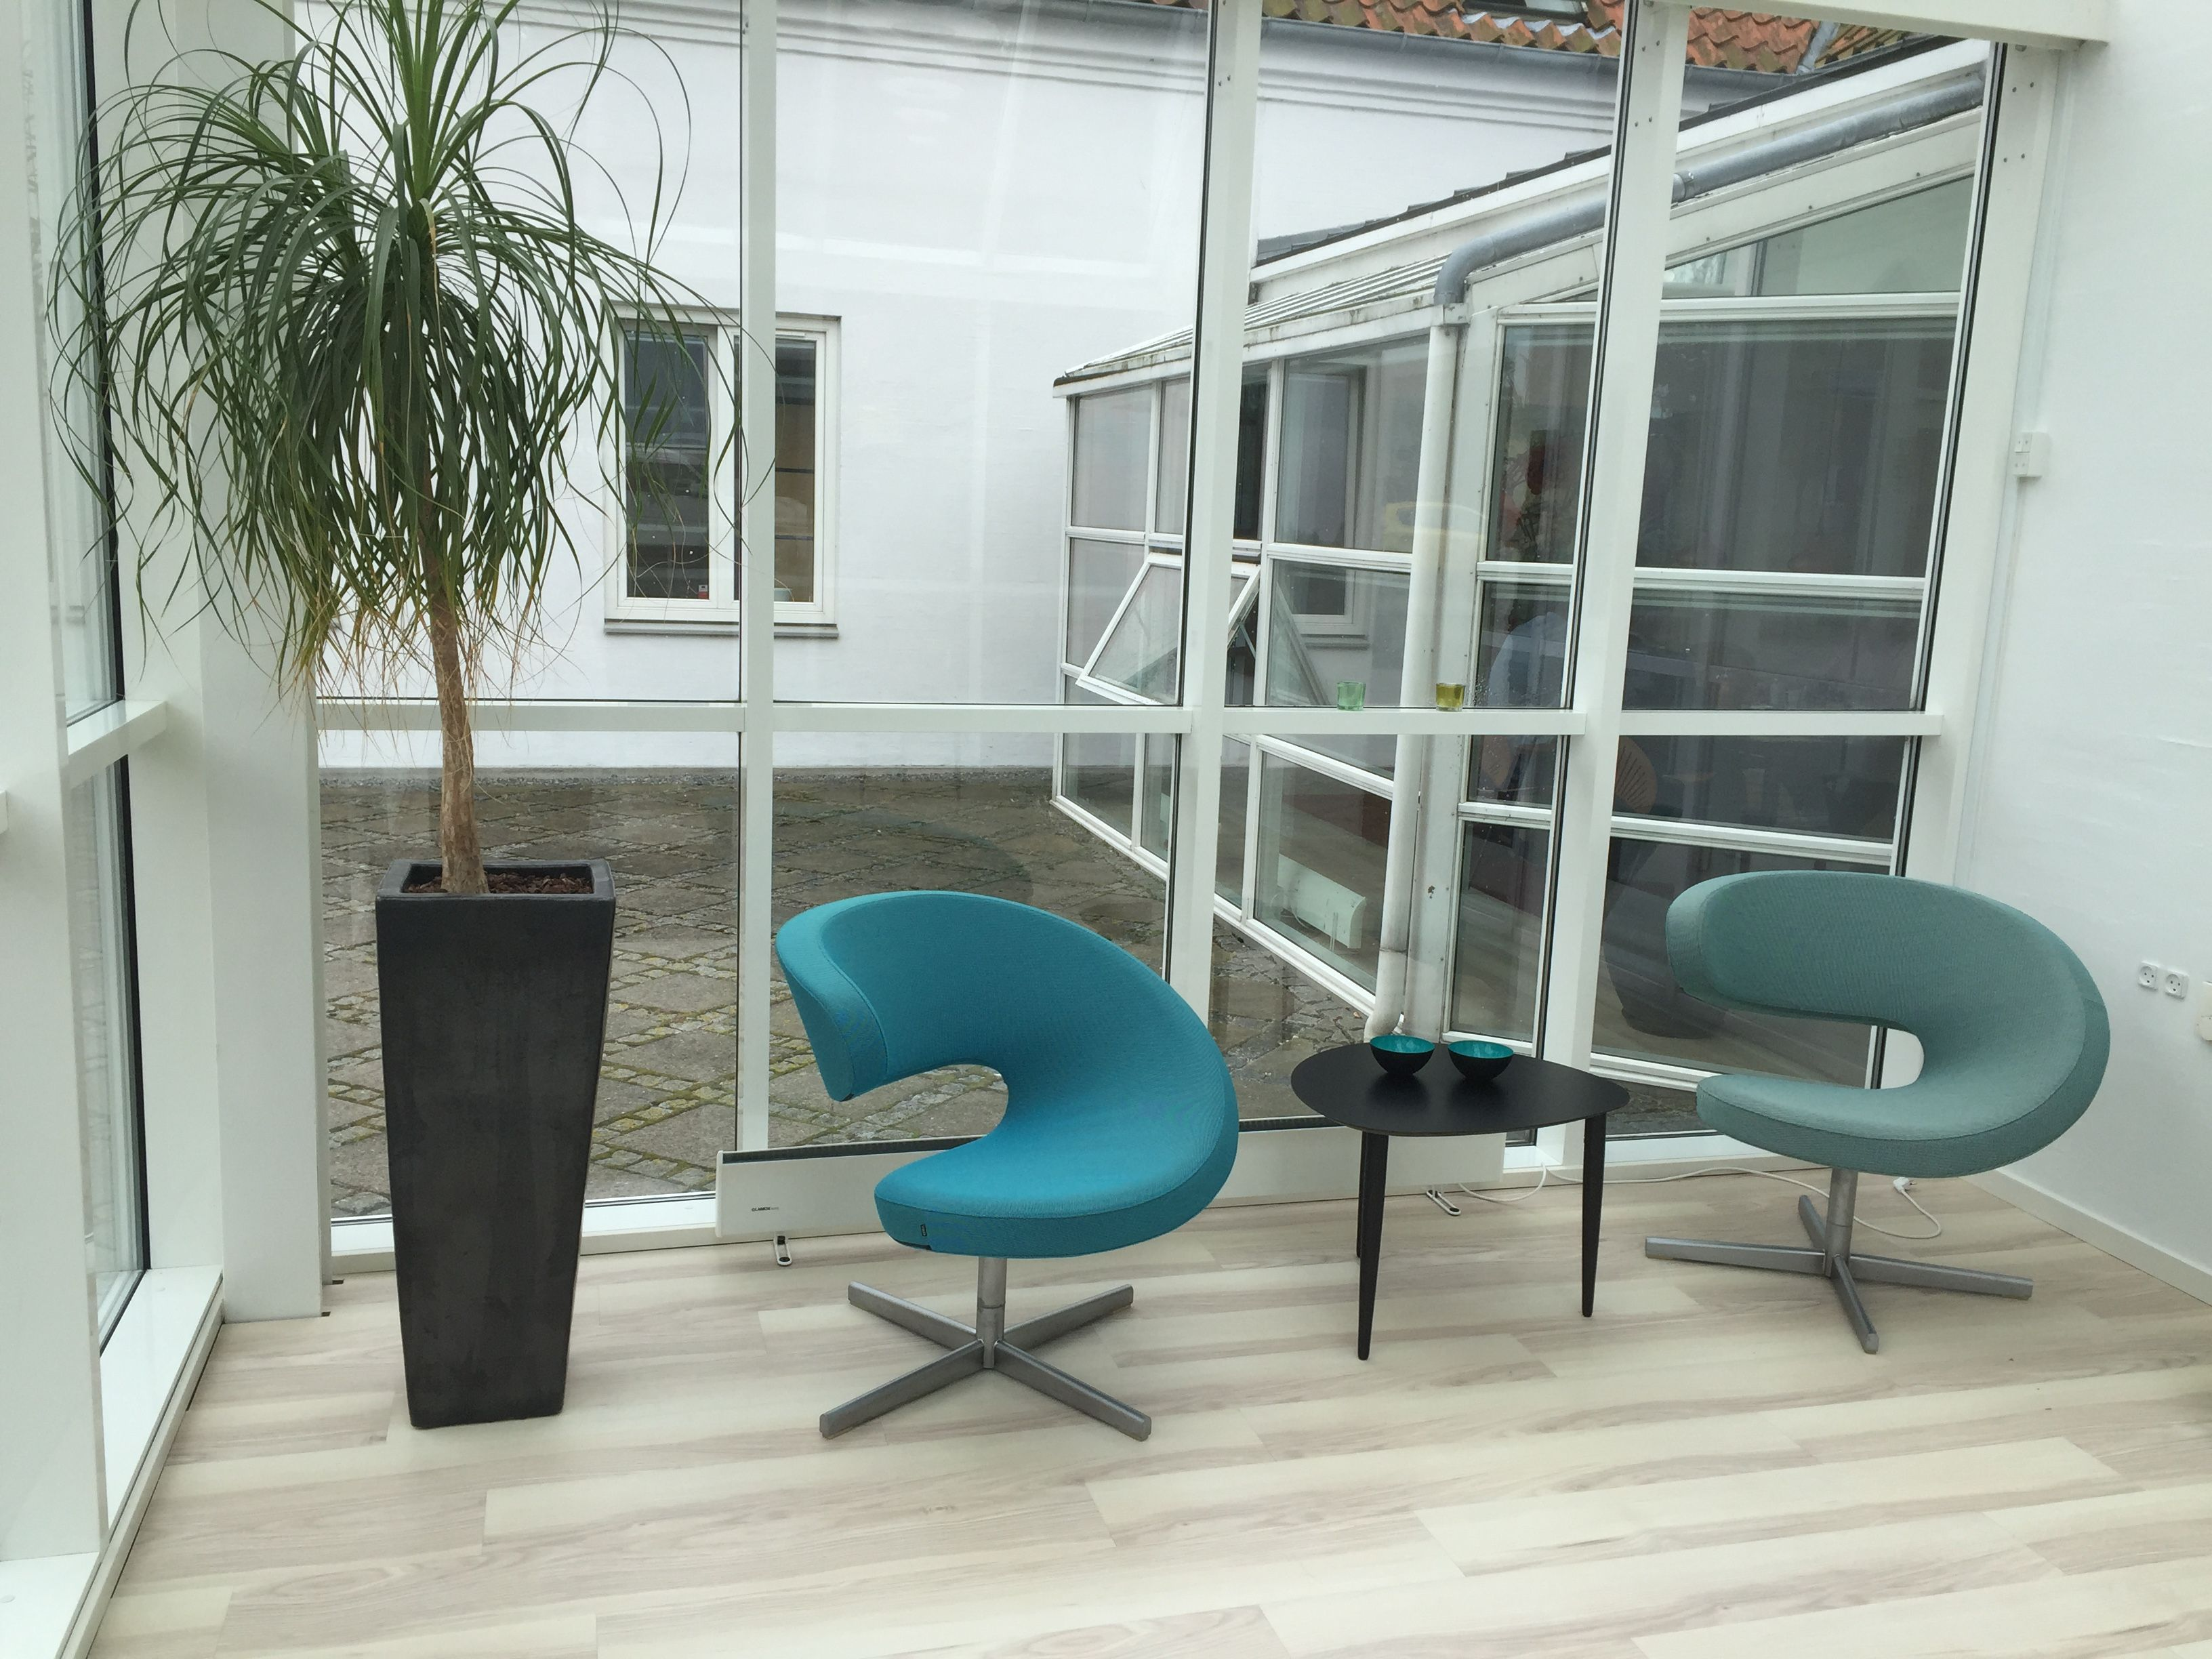 Foyer hos Advokatfirmaet Dreist K¸ge Peel Club loungestol fra